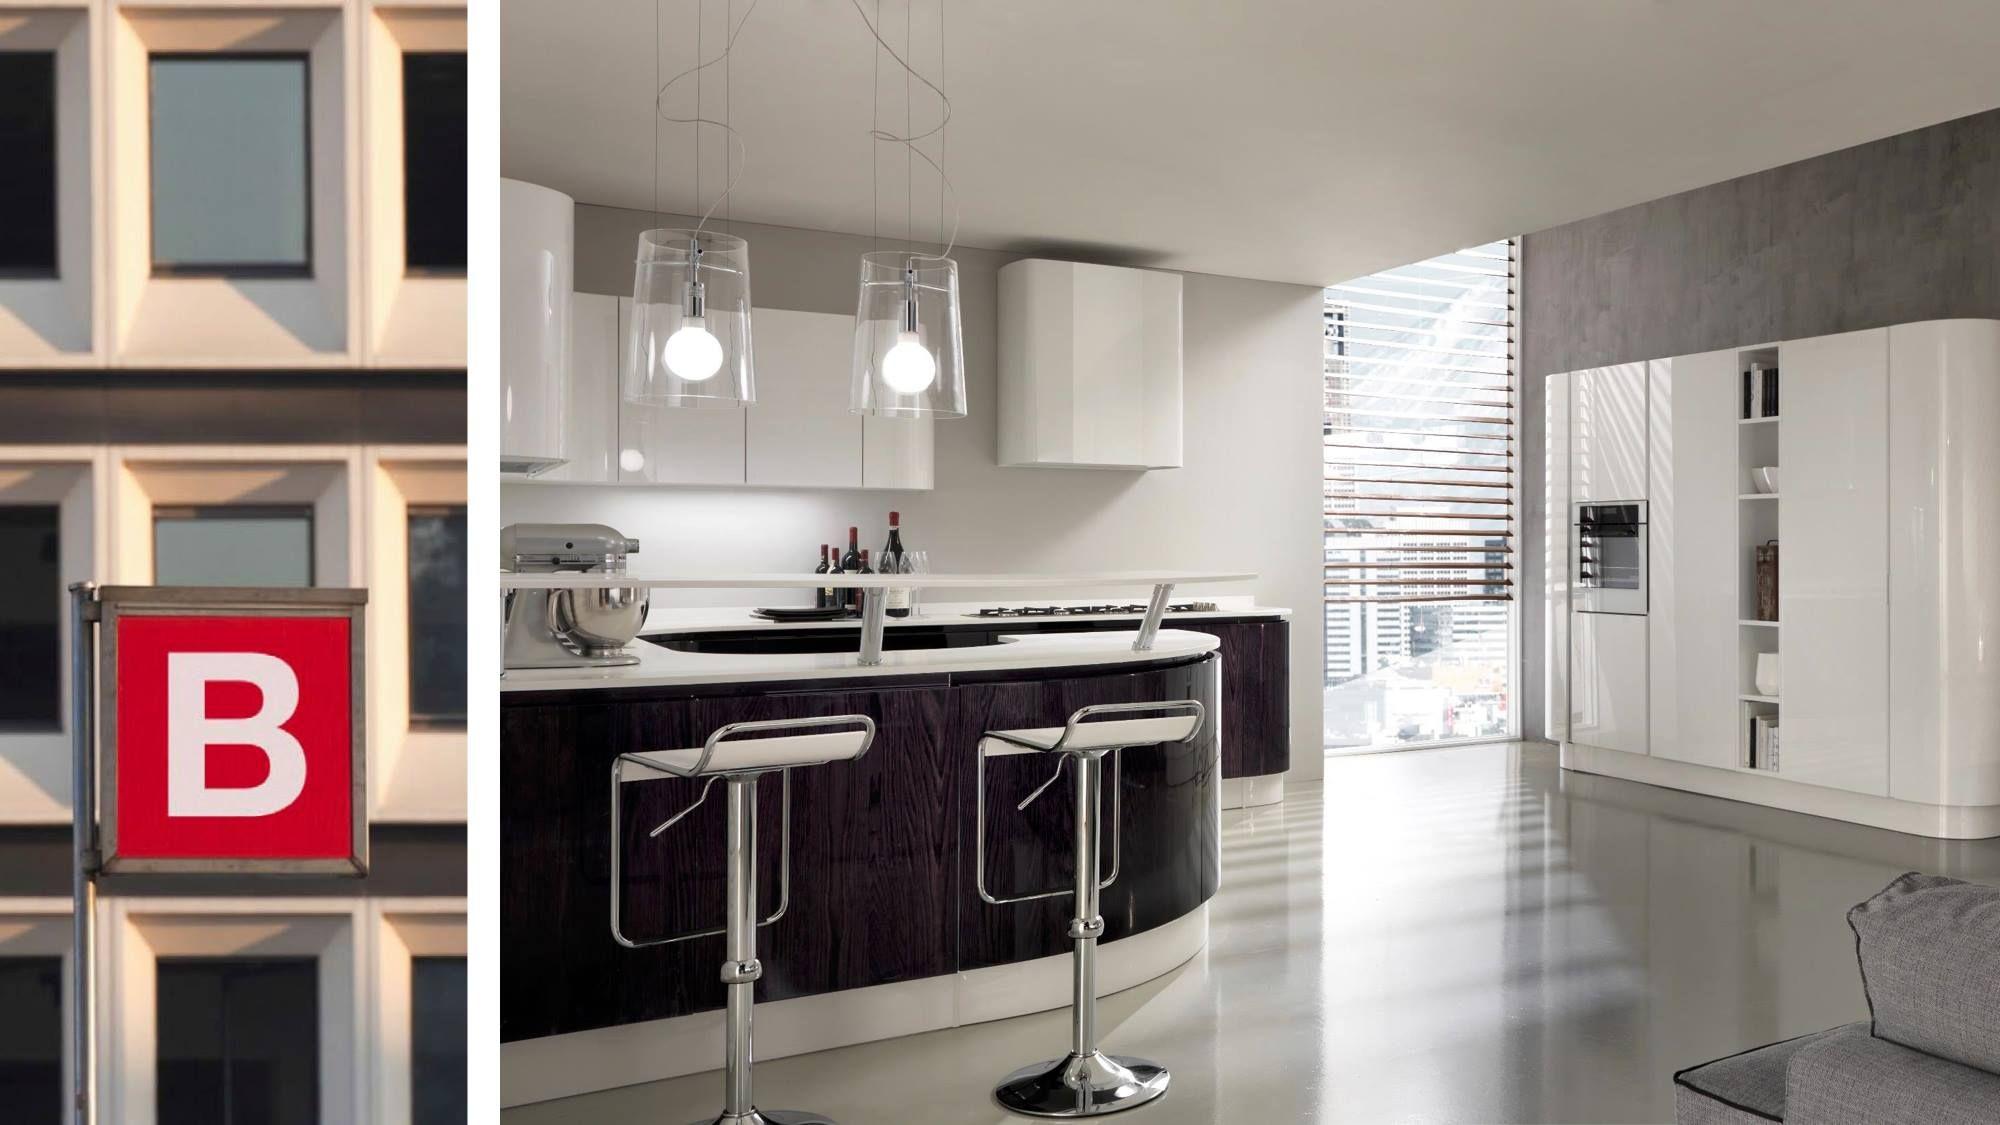 Cucina BERLONI mod. B50 | Novità d\'Arredo | Idee per la ...